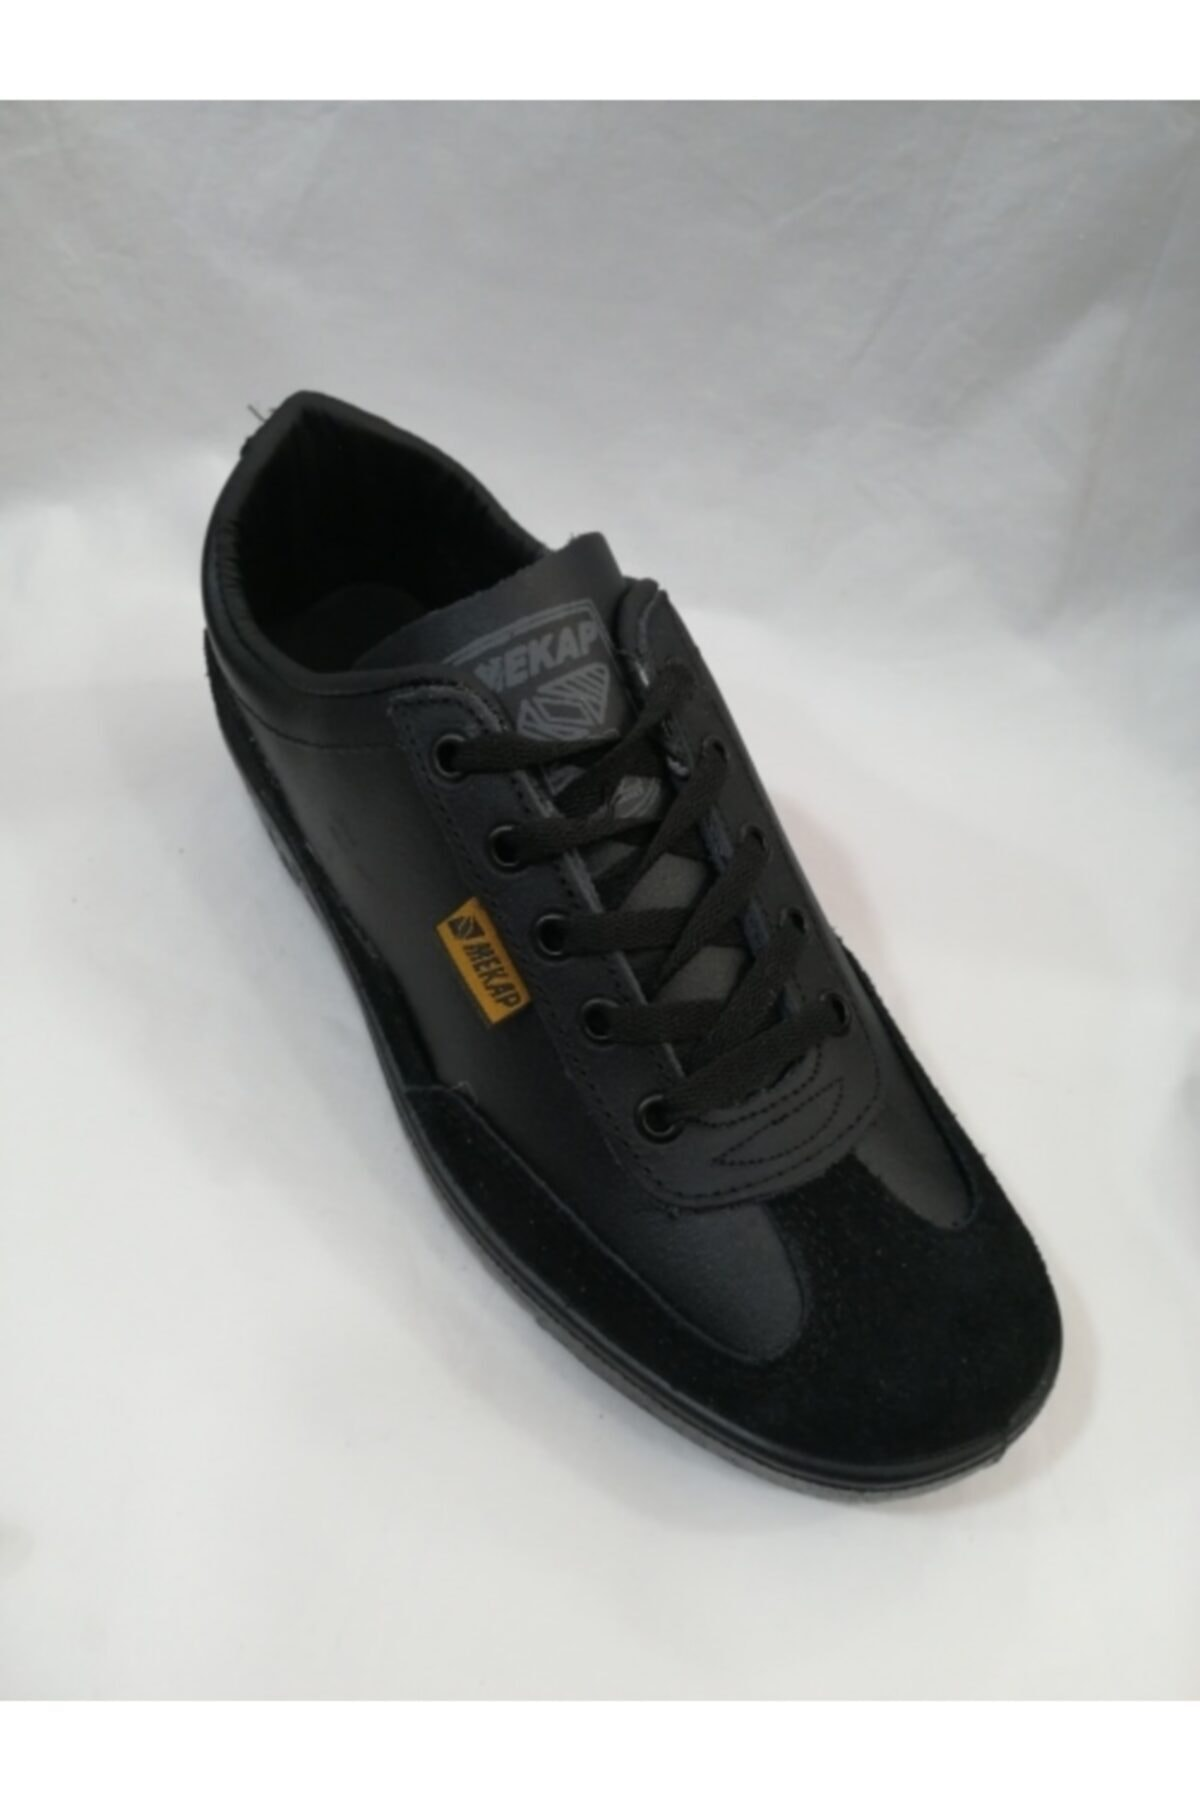 کفش کوهنوردی مردانه ست برند Mekap رنگ مشکی کد ty72844241